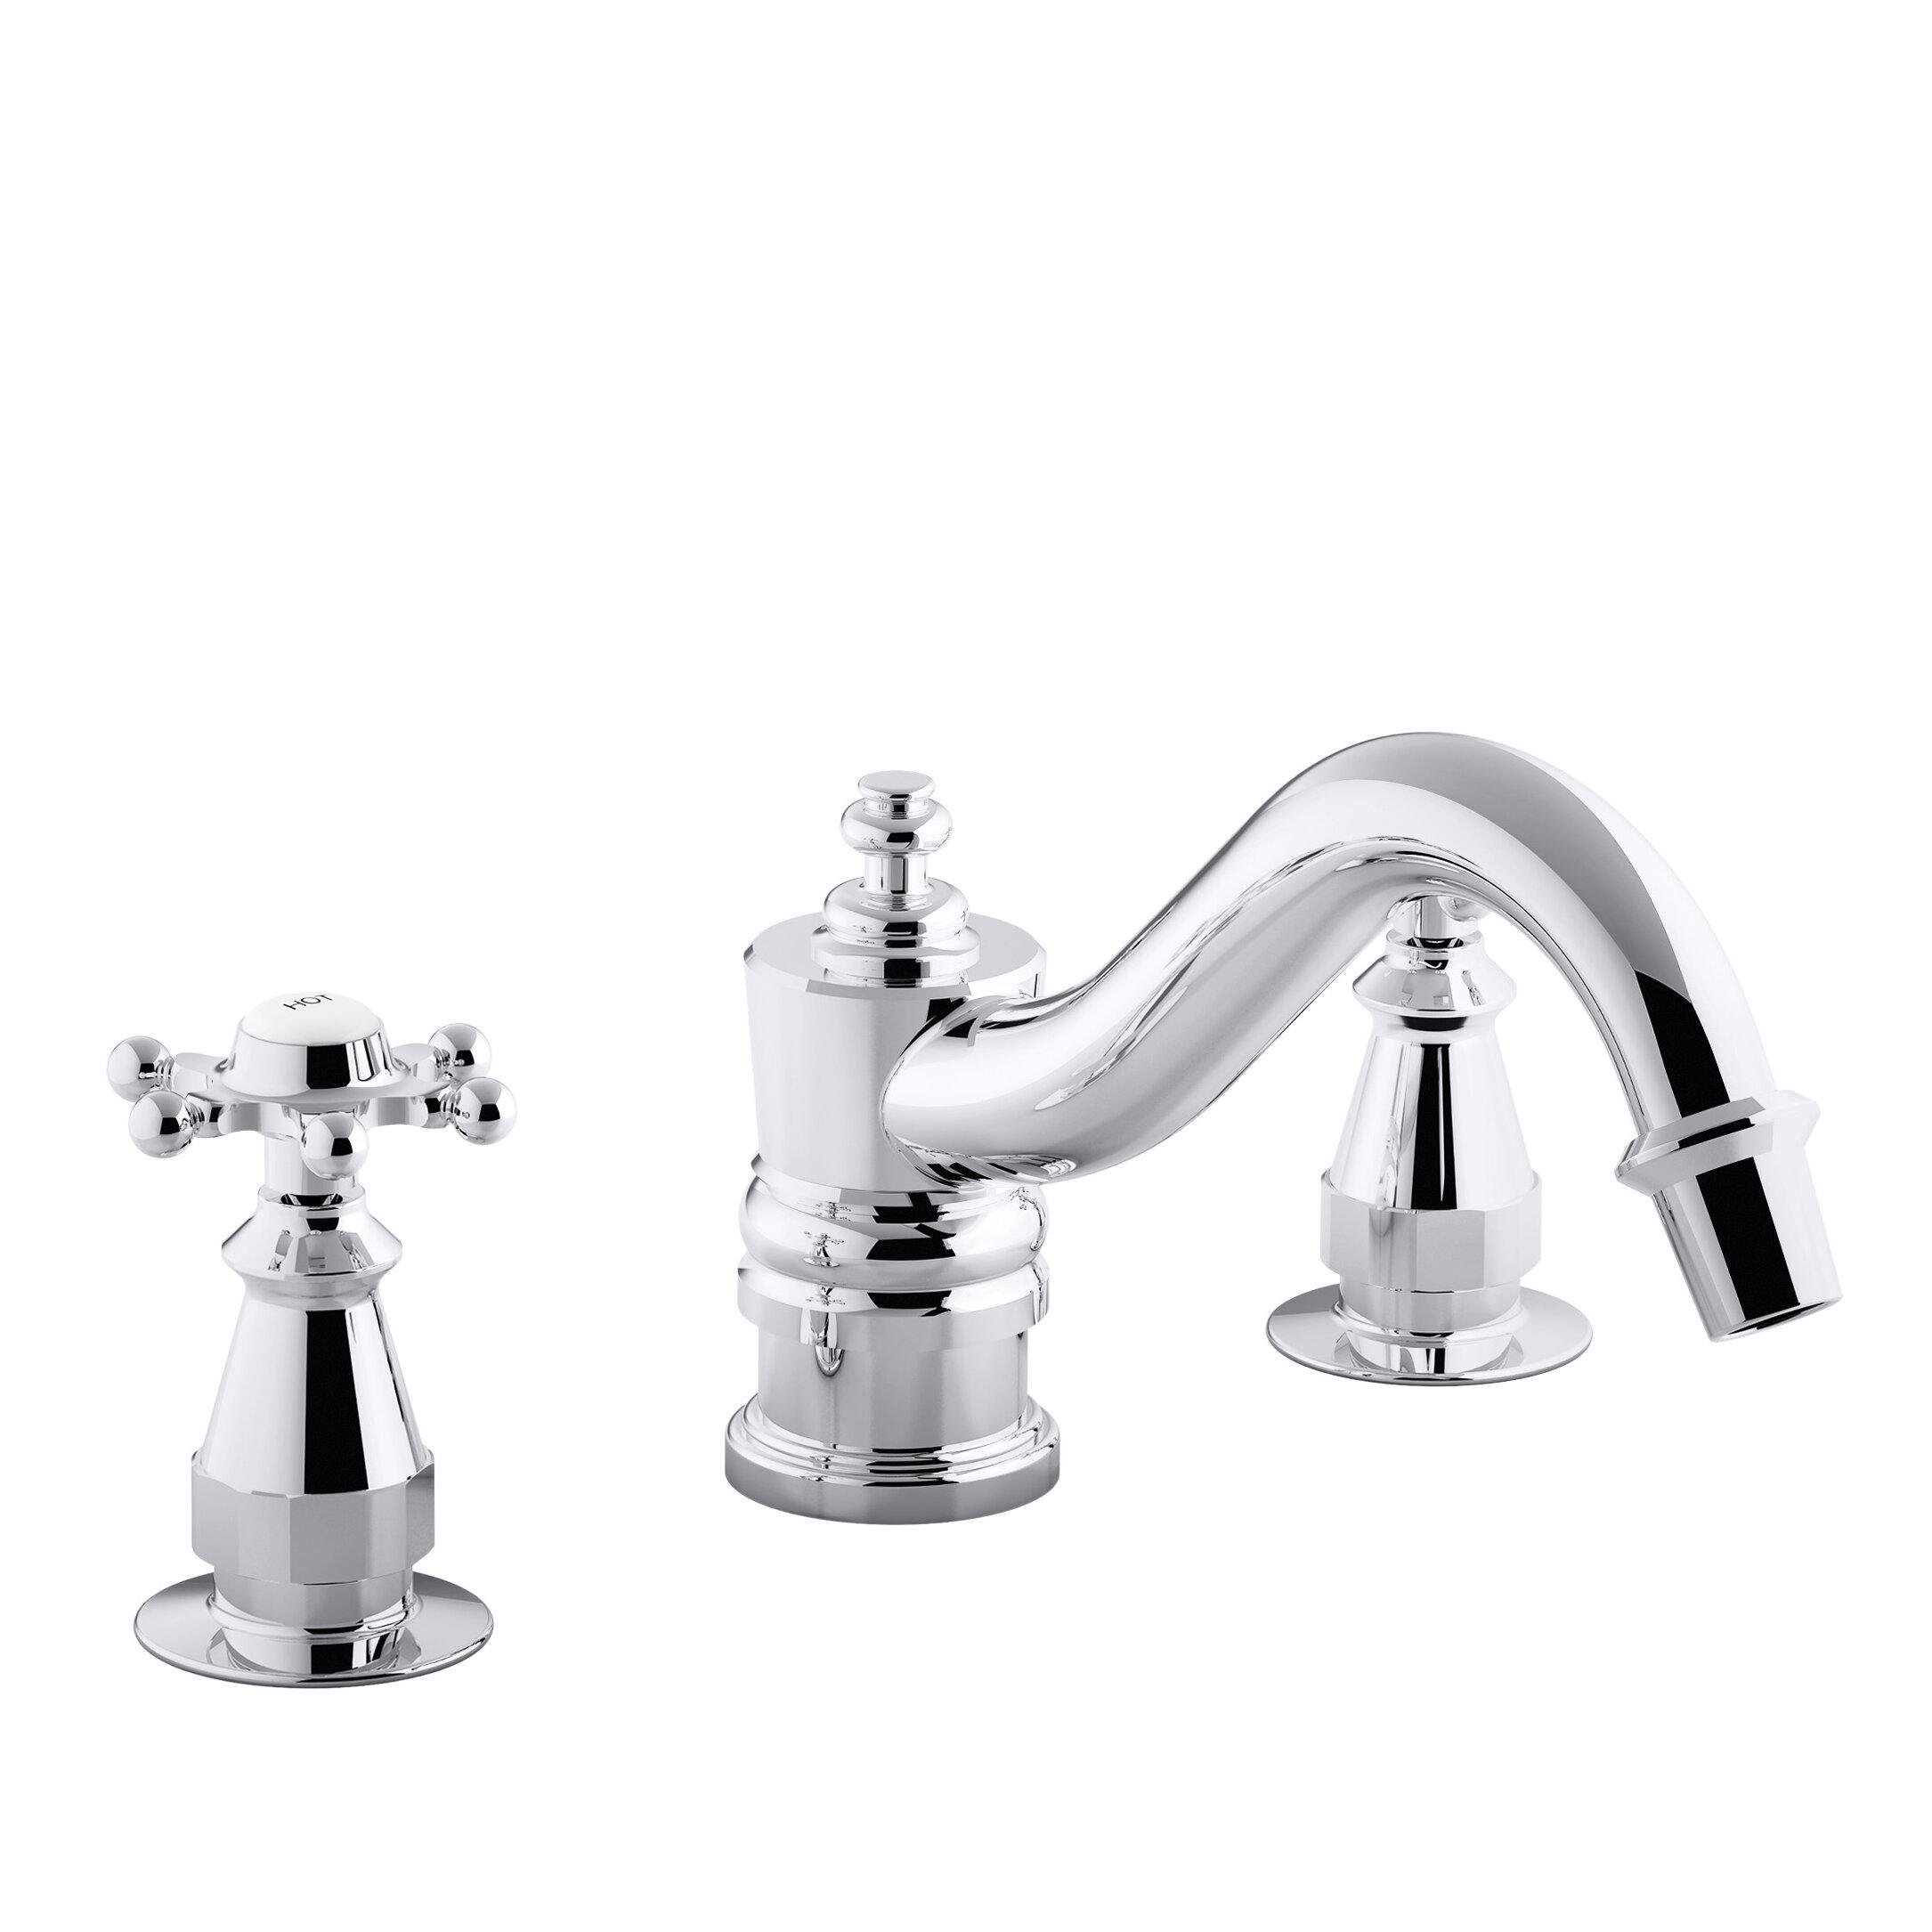 Picture of: Kohler Antique Bath Faucet Trim For Deck Mount High Flow Valve With 6 Prong Handles Valve Not Included Wayfair